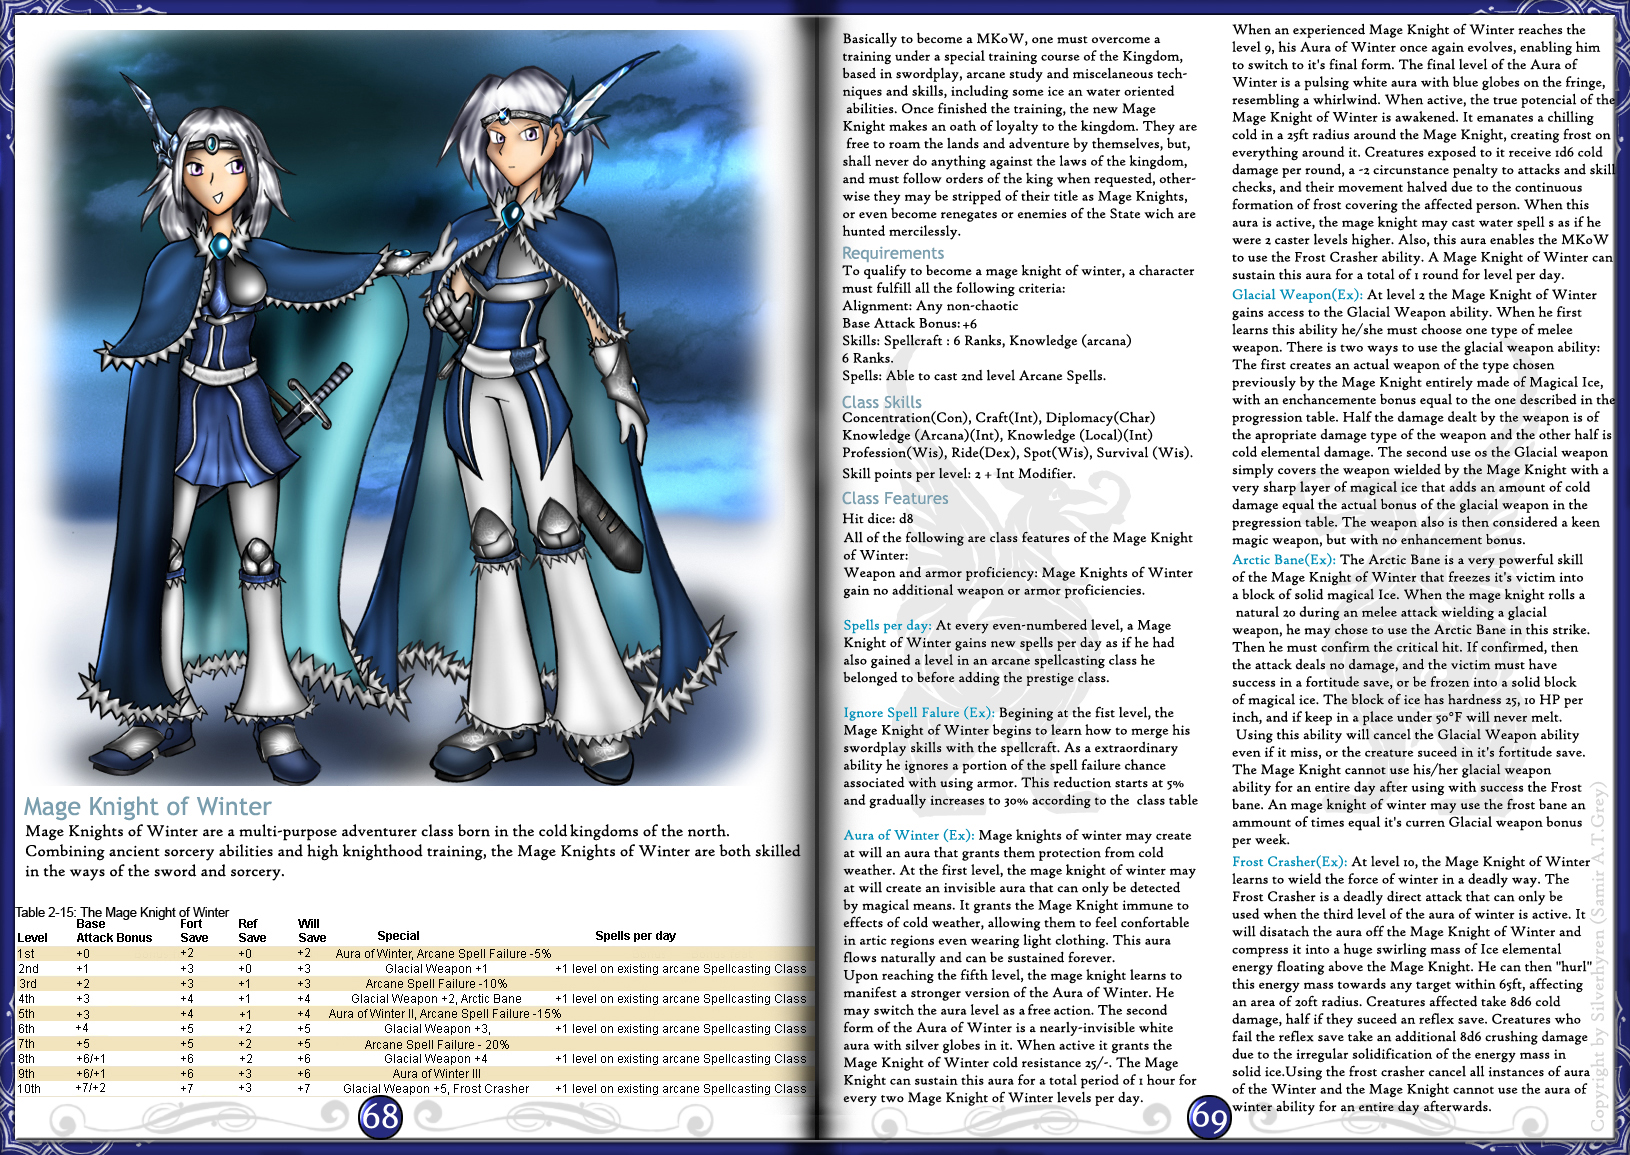 Mage Knight of Winter by Silverhyren